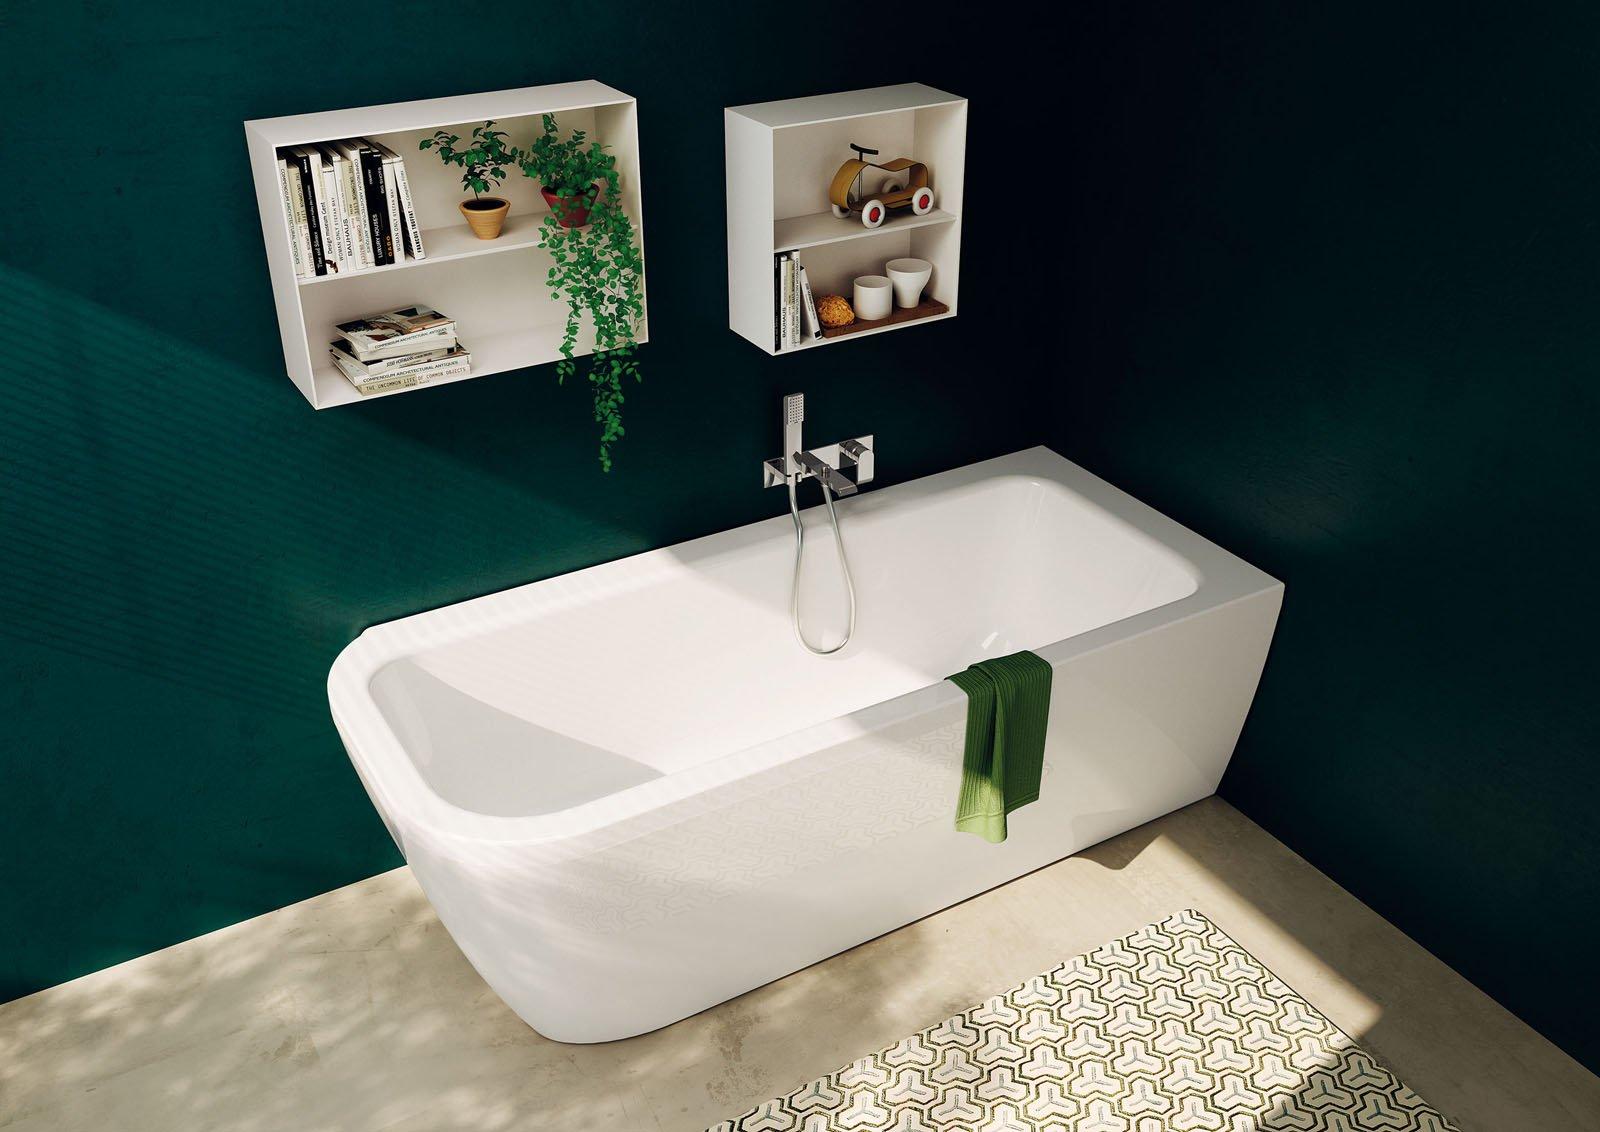 Vasca Da Bagno 120 70 Prezzi : Vasche da bagno low cost a partire da euro cose di casa